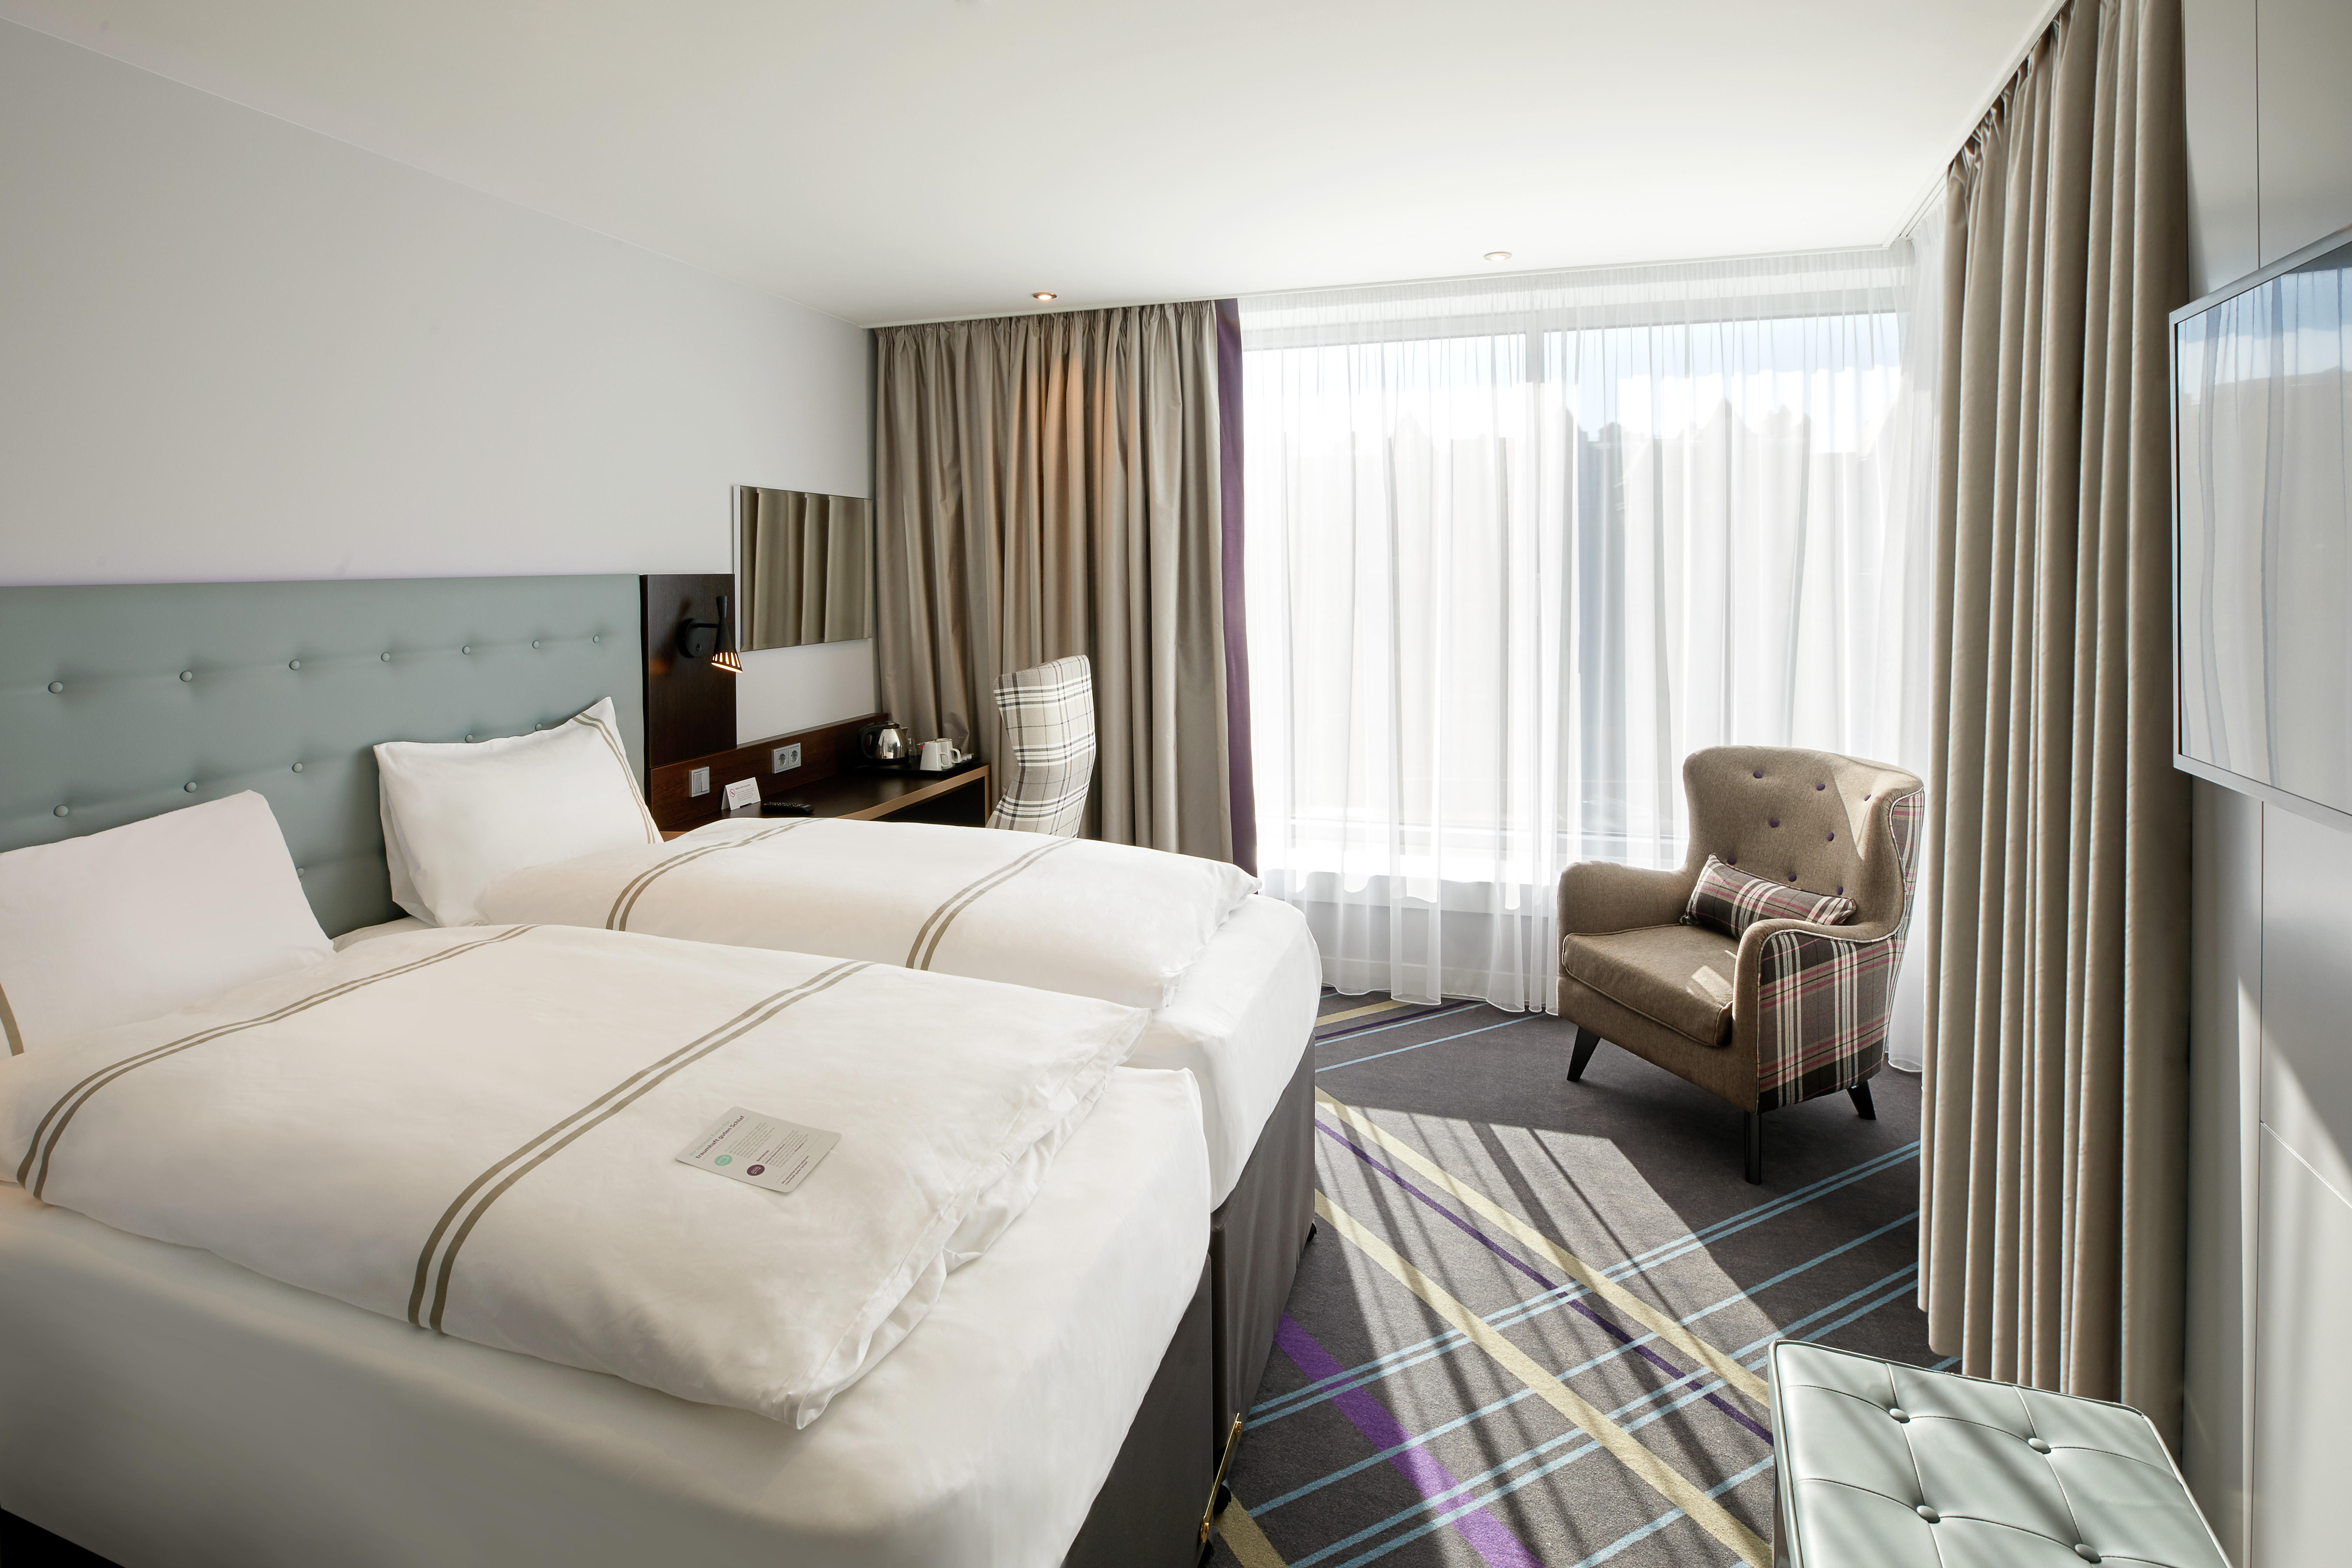 Premier Inn Essen City Centre hotel